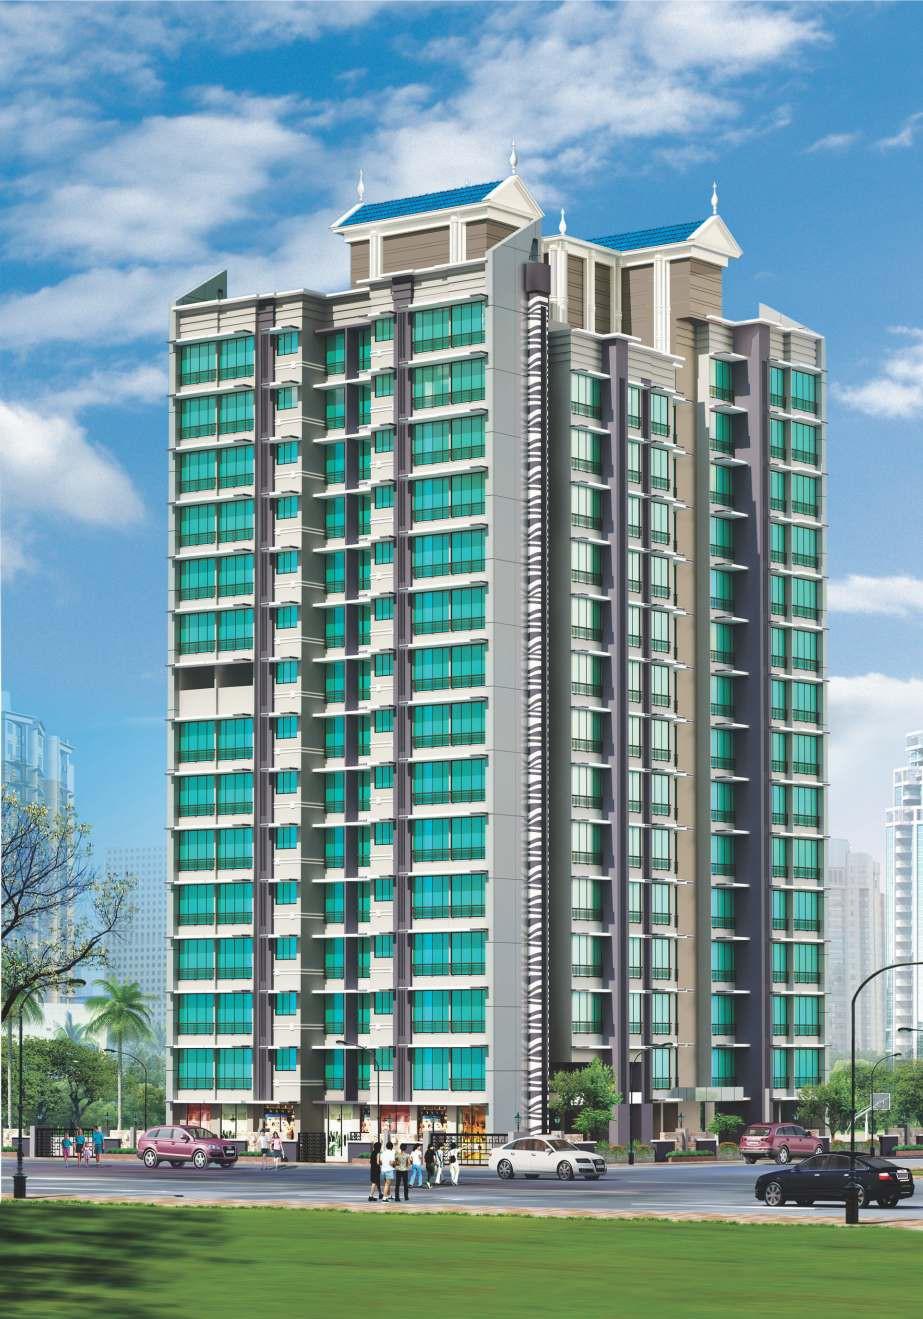 2 & 3 BHK Flats & Shops in Borivali West in Wadhwana Madhuban Heights